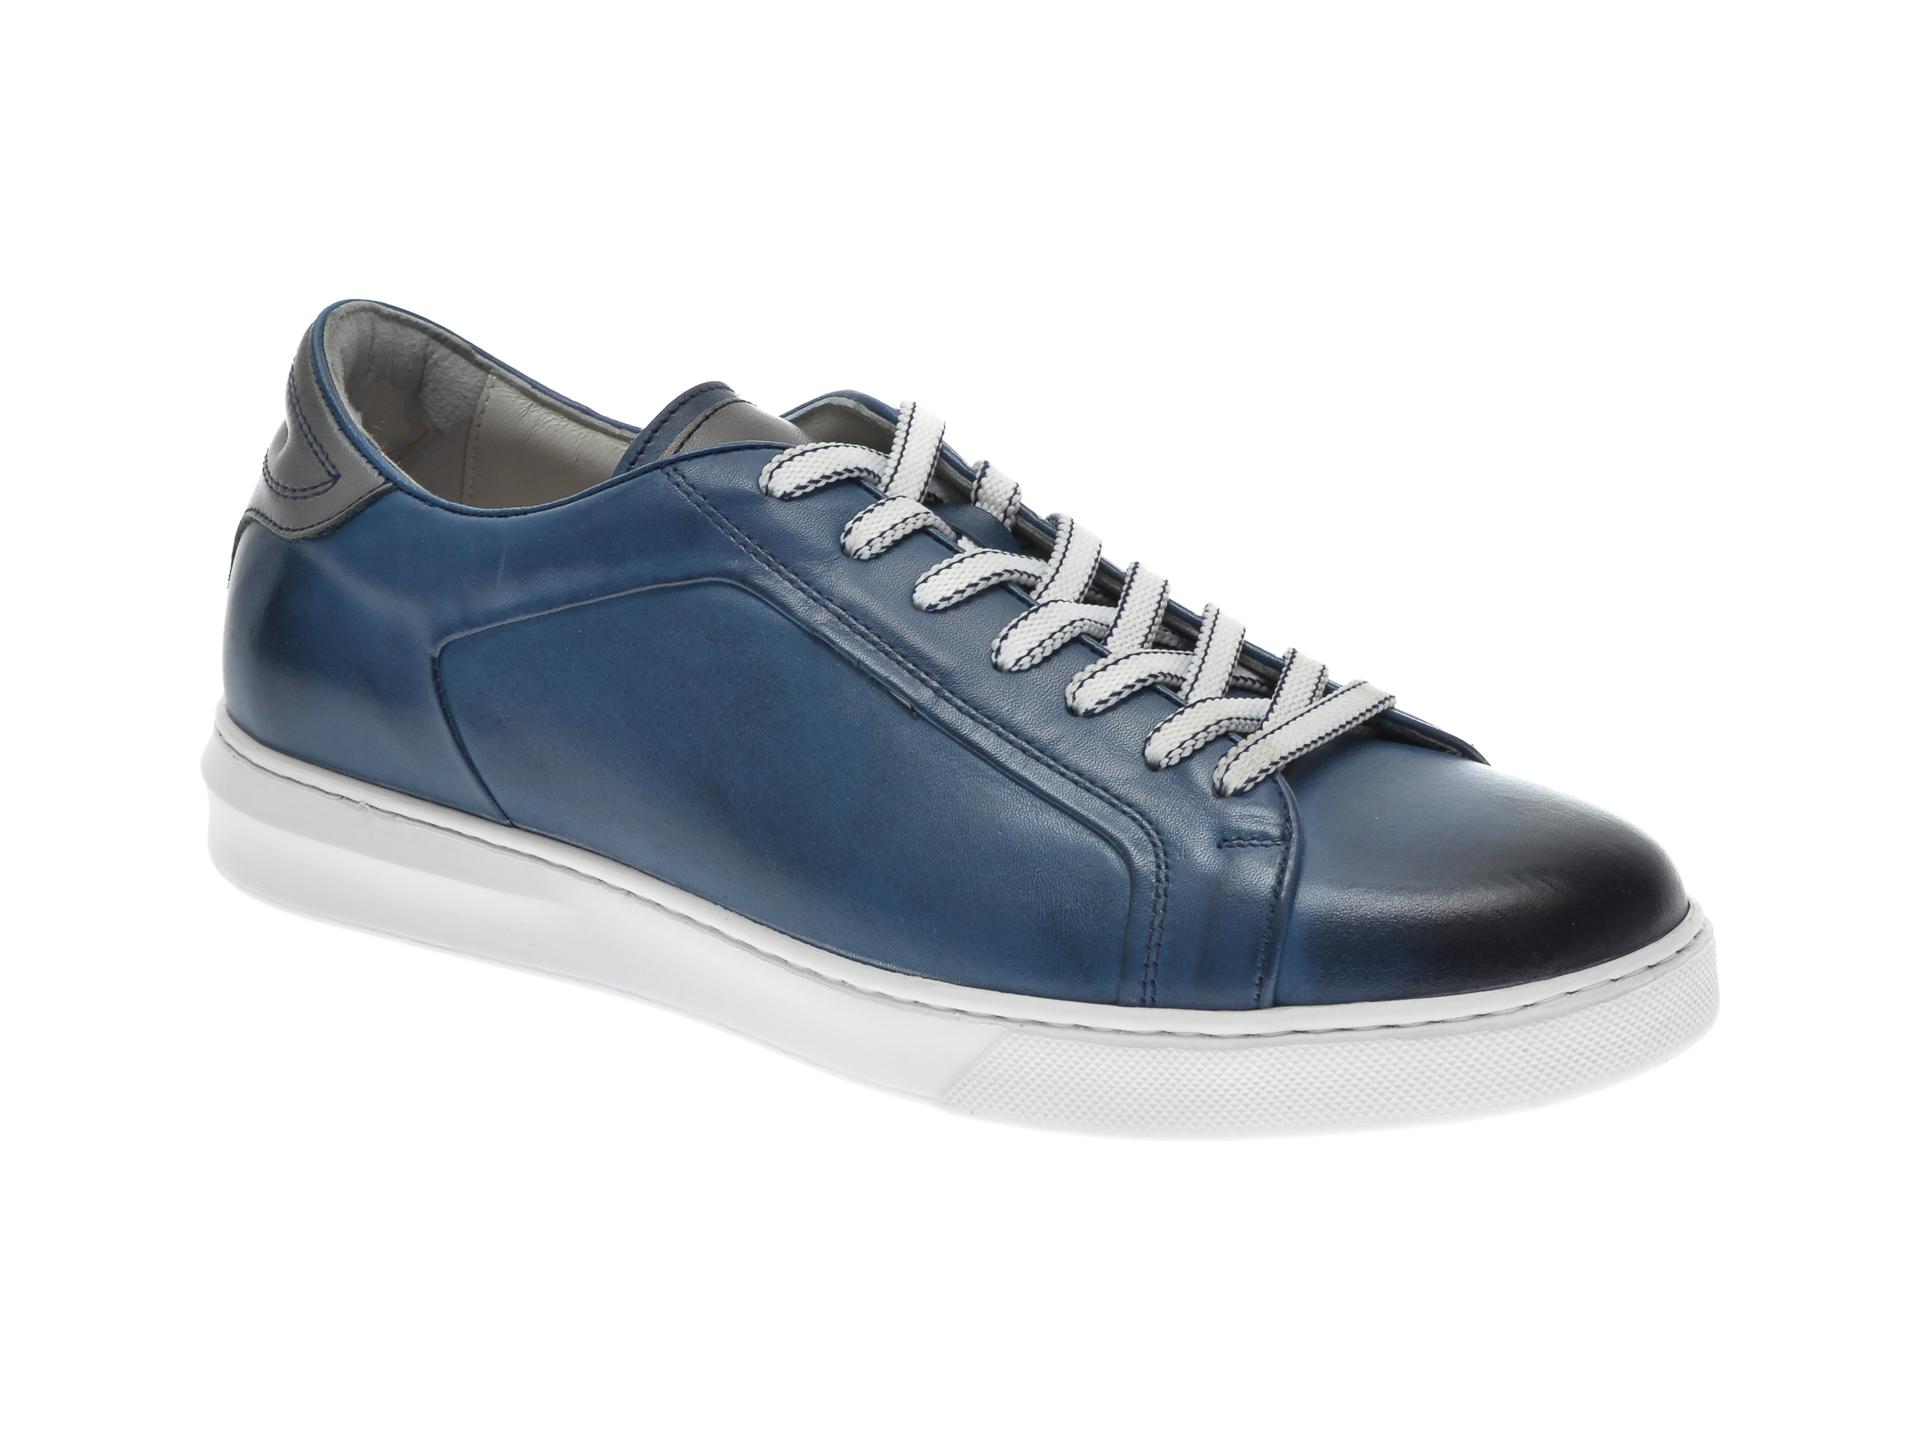 Pantofi OTTER bleumarin, 3384, din piele naturala imagine